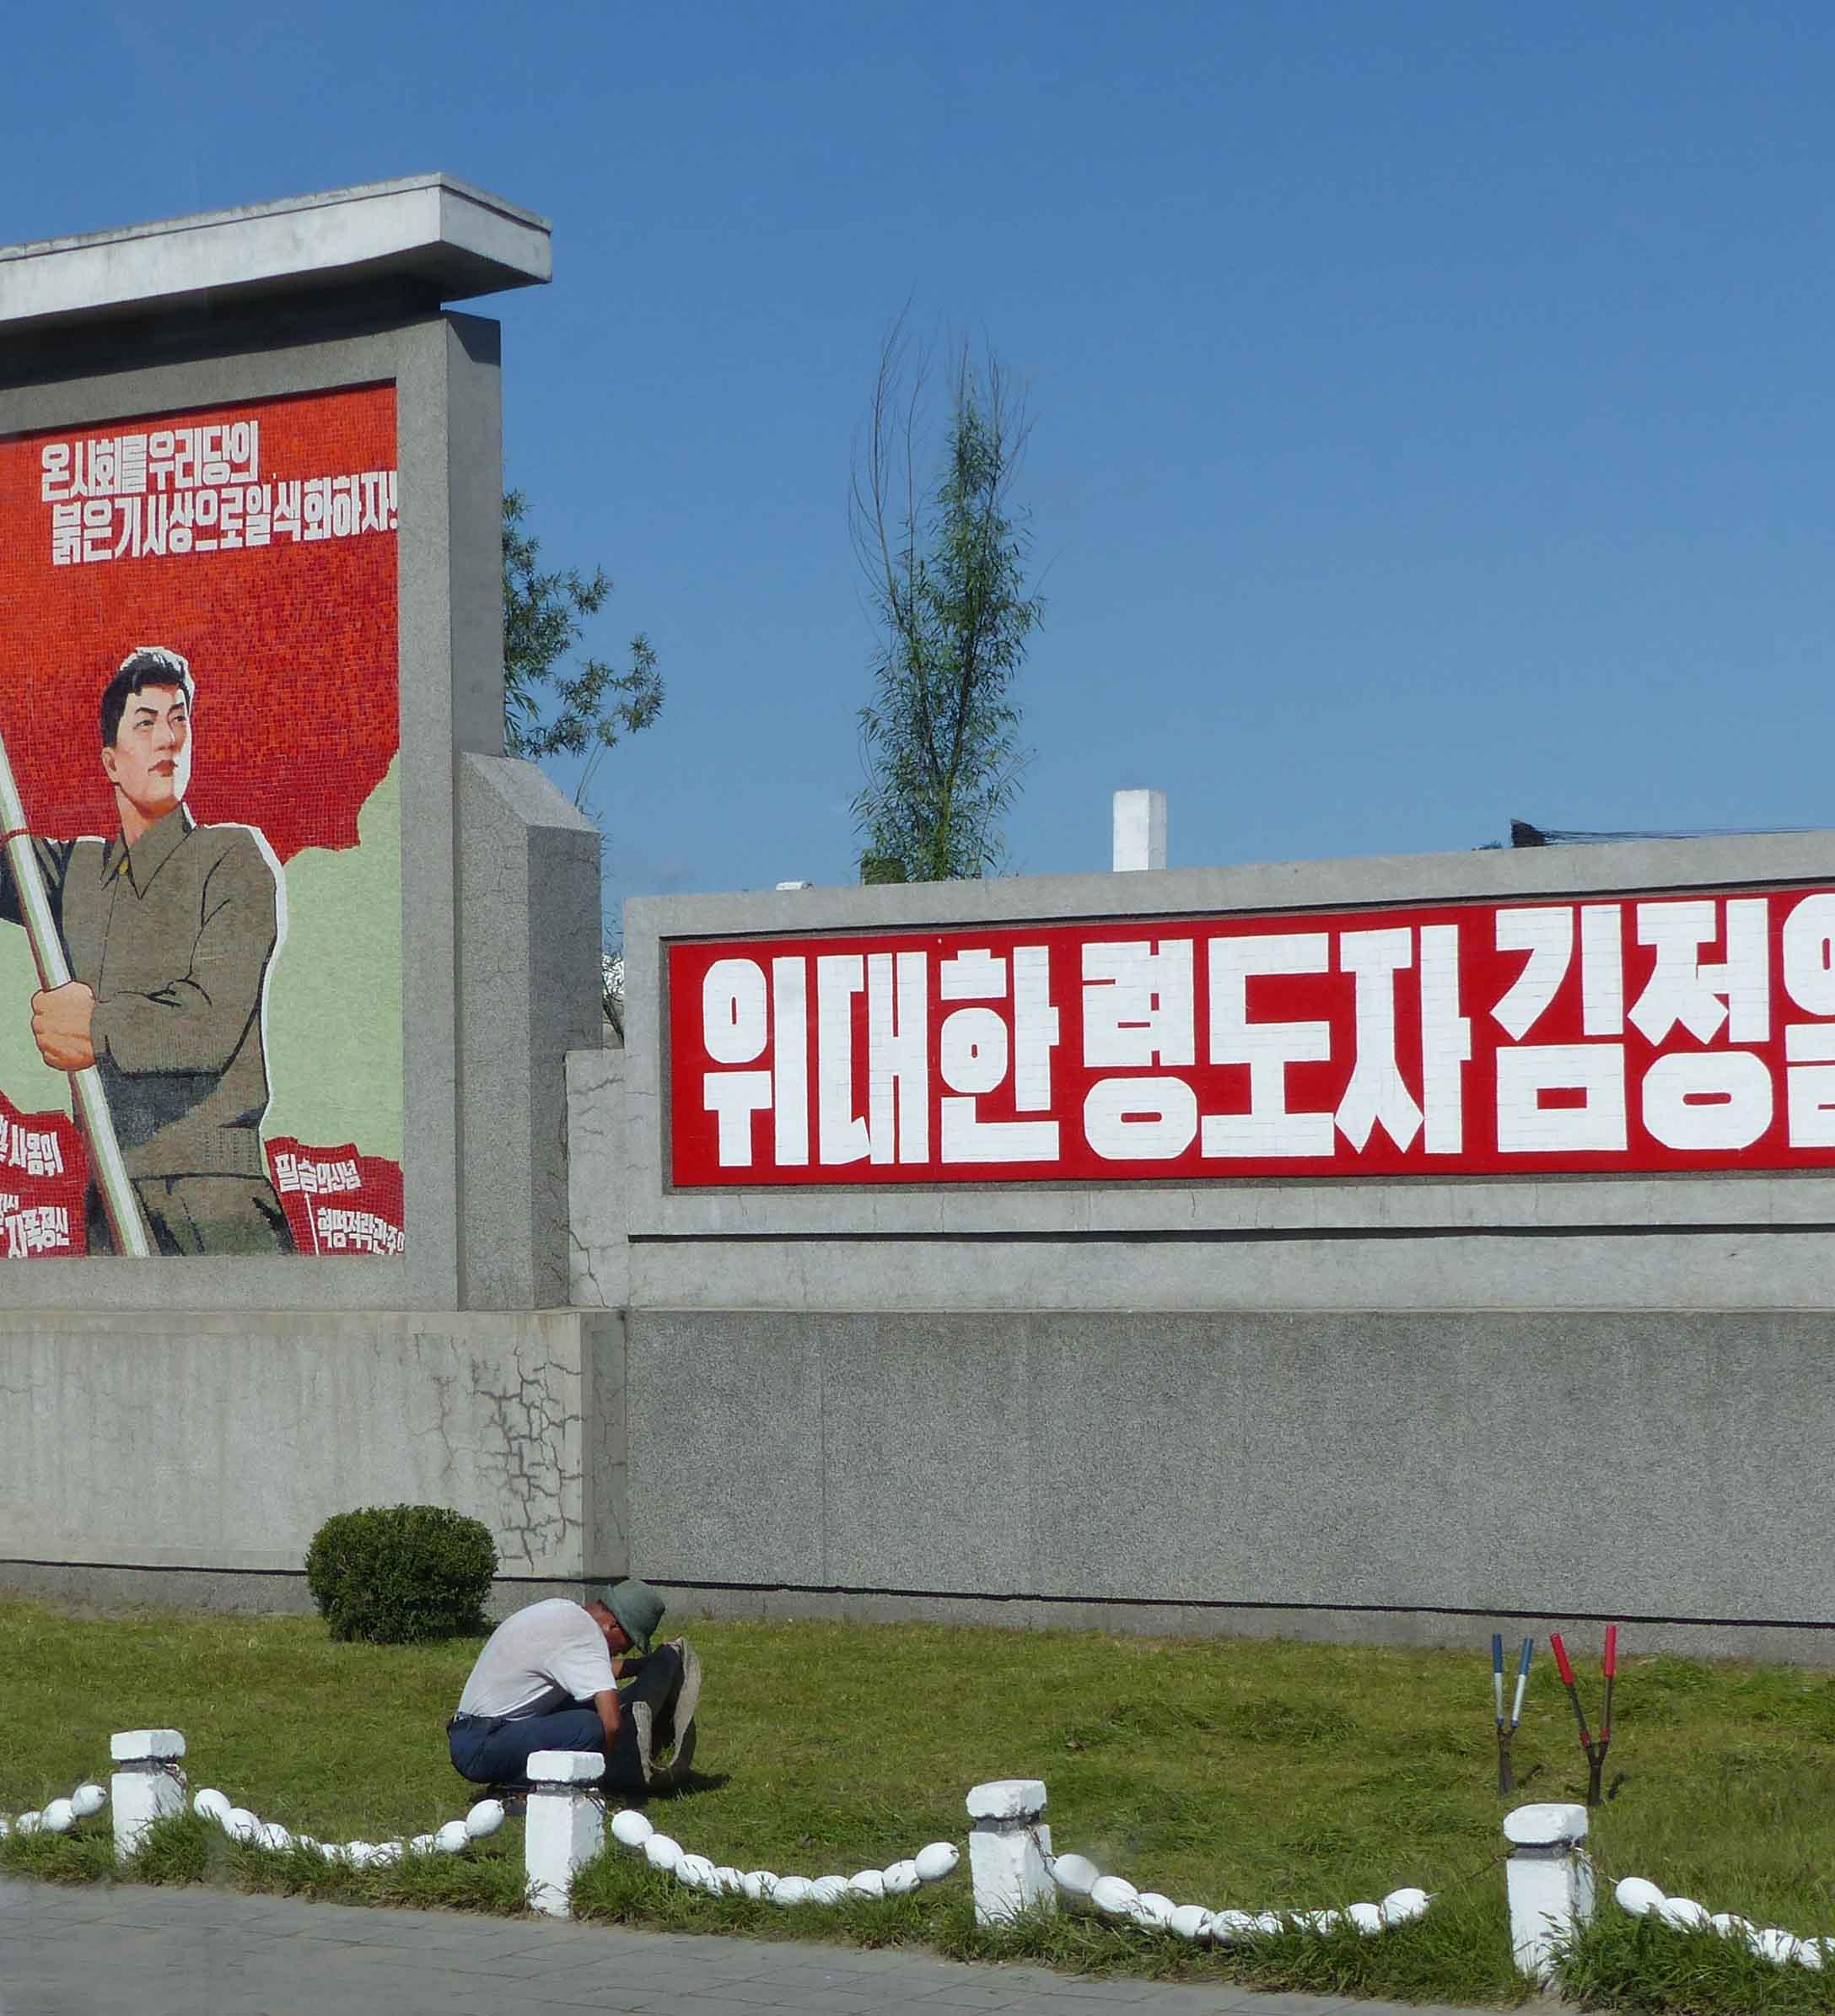 Man gardening in front of propaganda poster